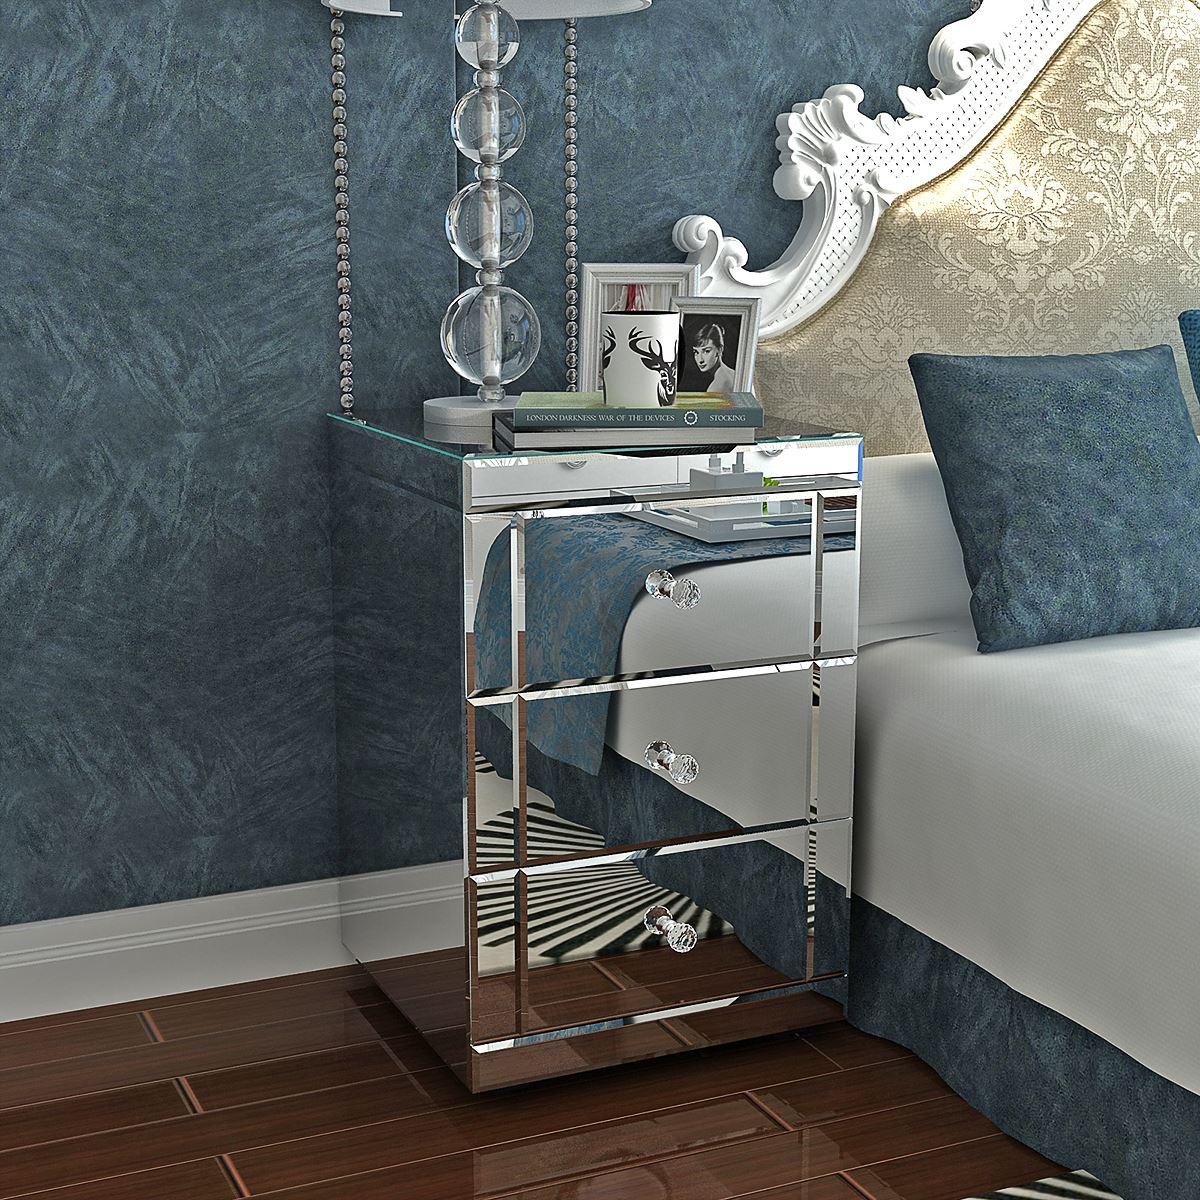 Panana armoire de chevet miroir/Table de chevet/commode 3 tiroirs chambre Table de chevet